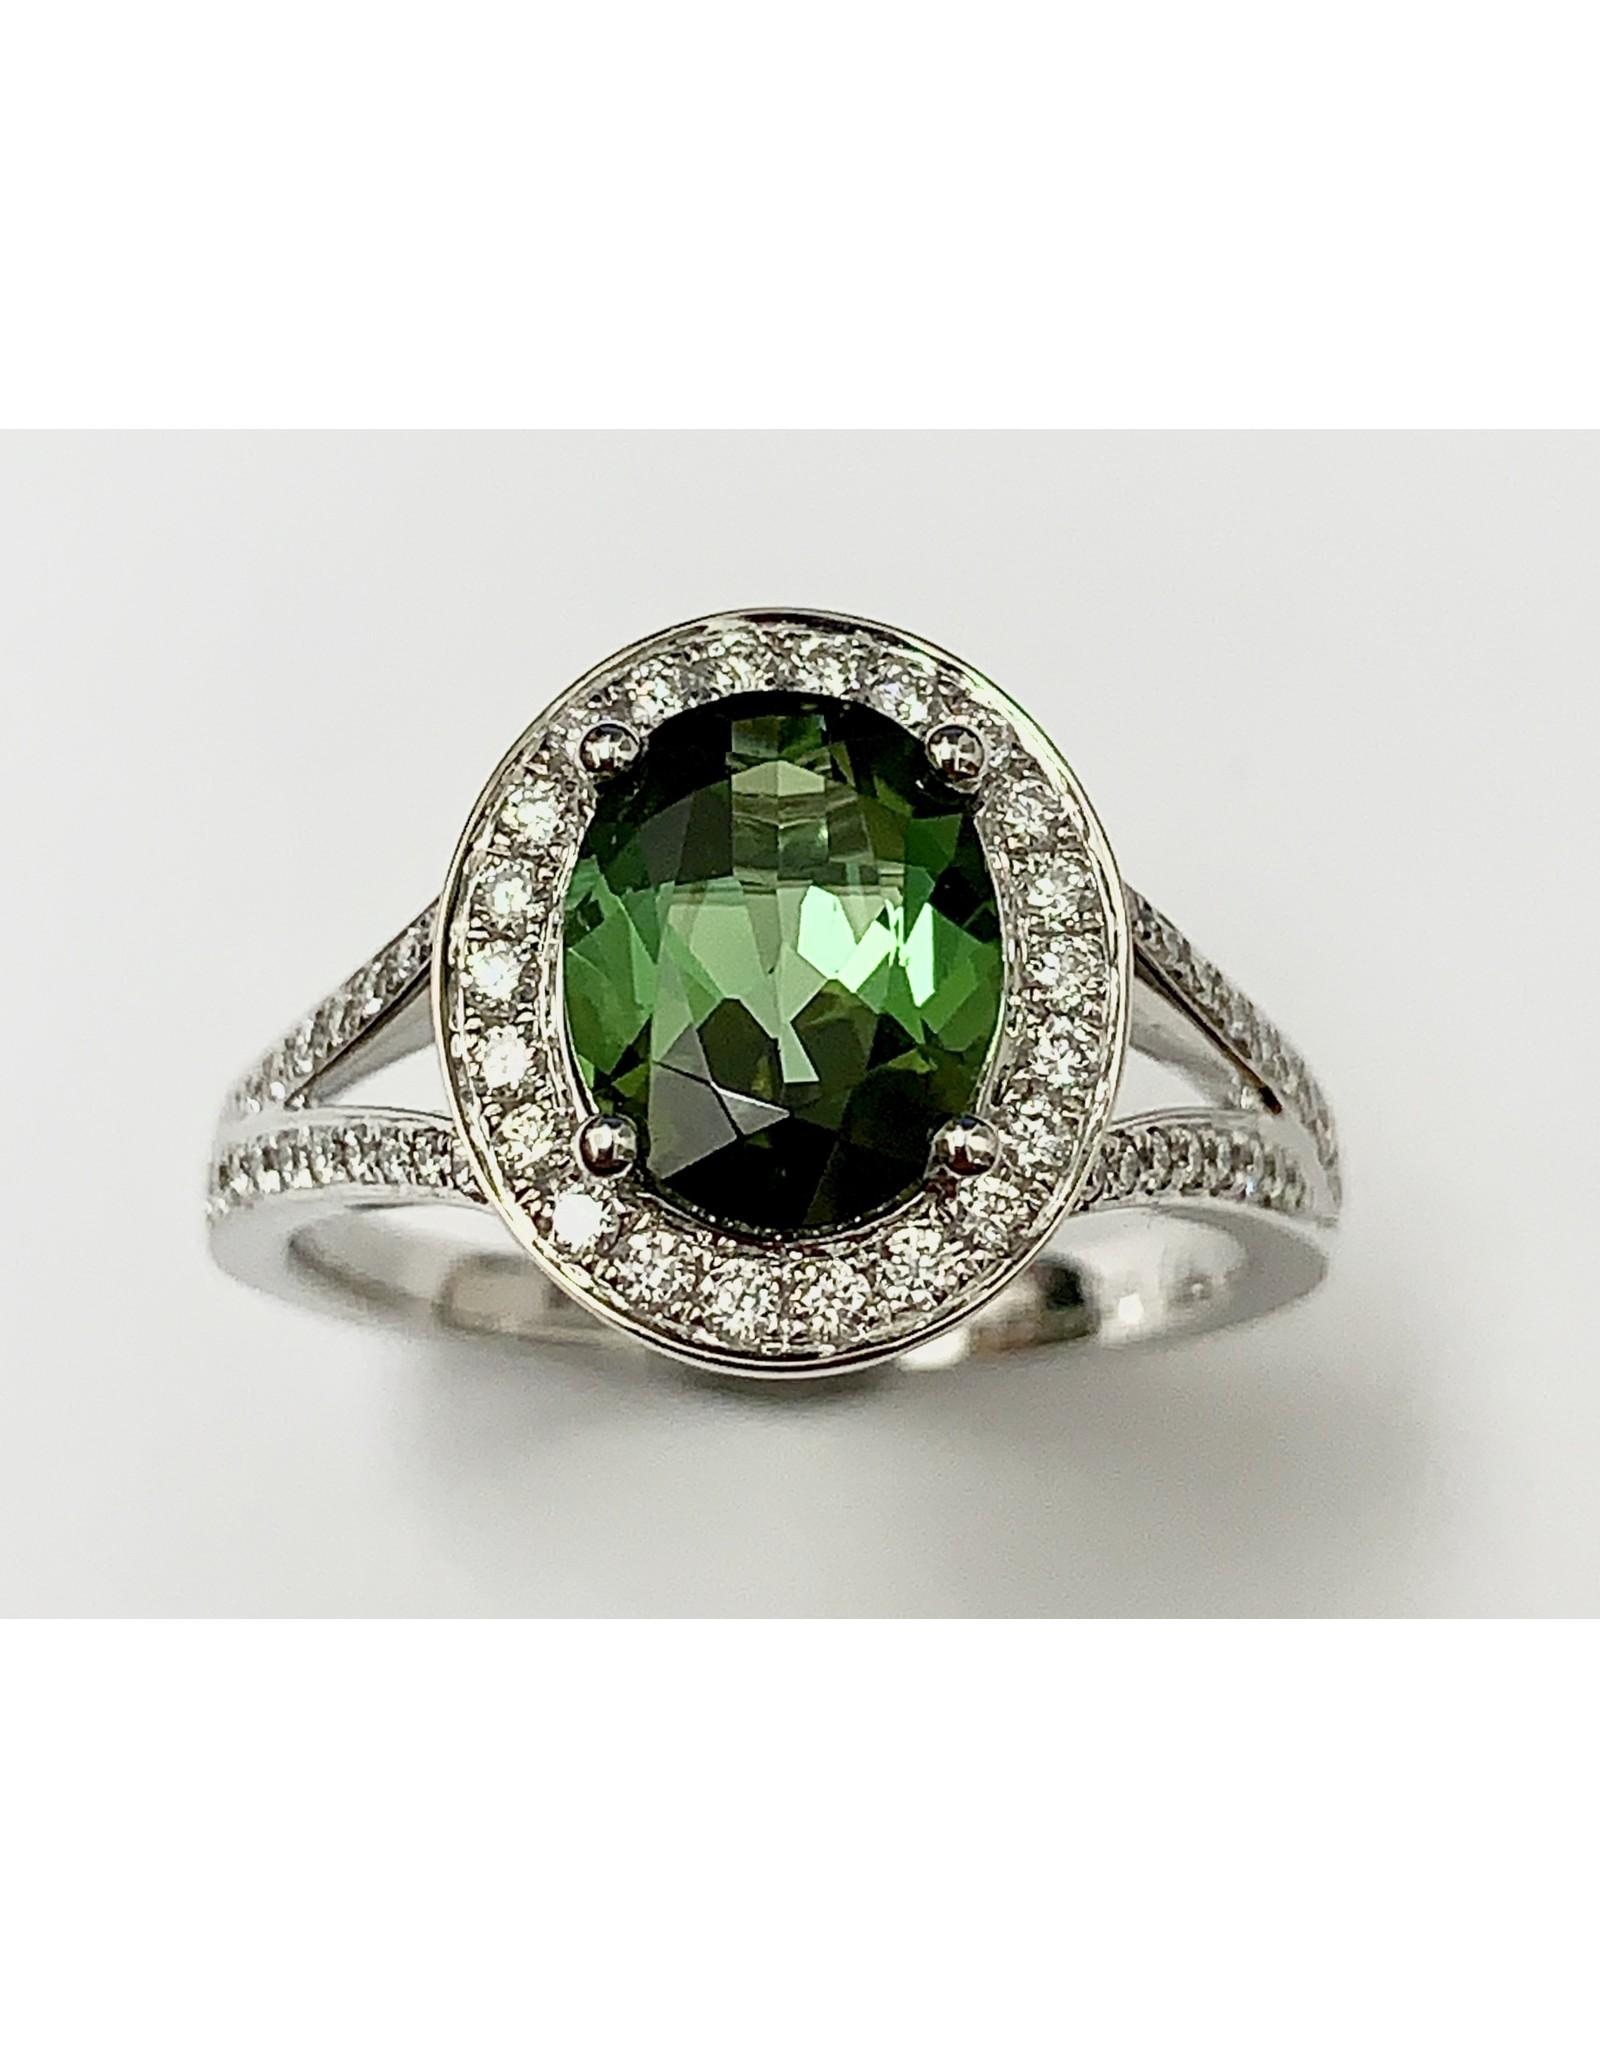 Green Tourmaline & Diamond Ring 14KW